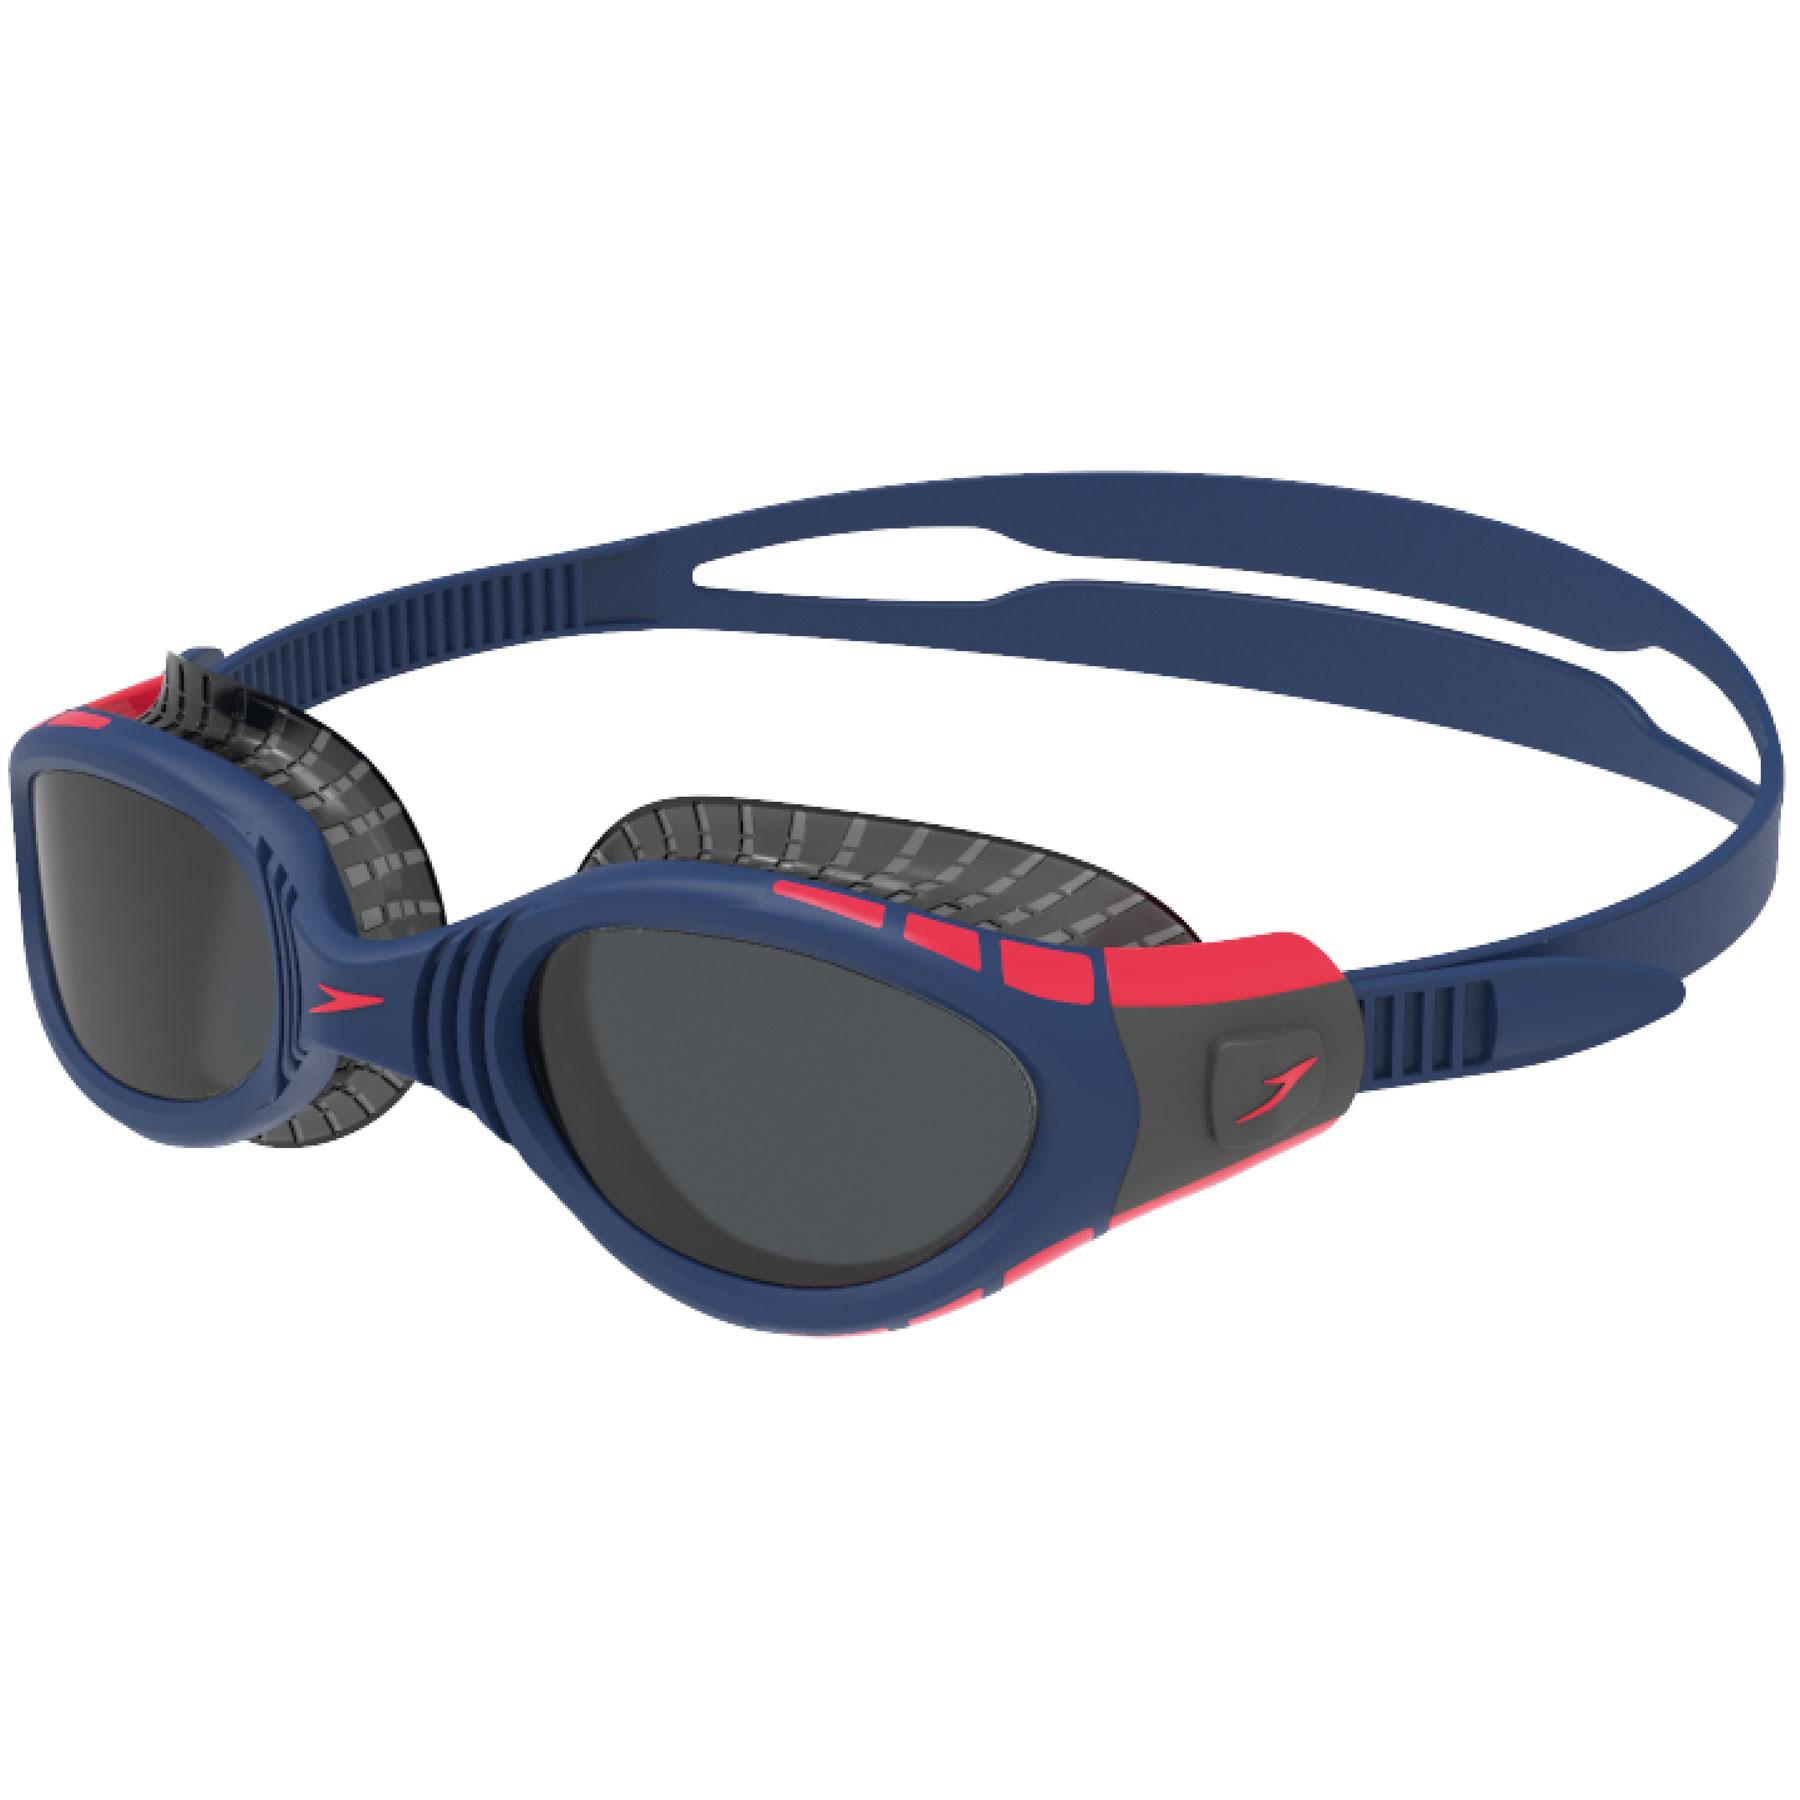 Speedo Futura Biofuse Flexiseal Triathlon Navy/Phoenix Red/Charcoal Schwimmbrille